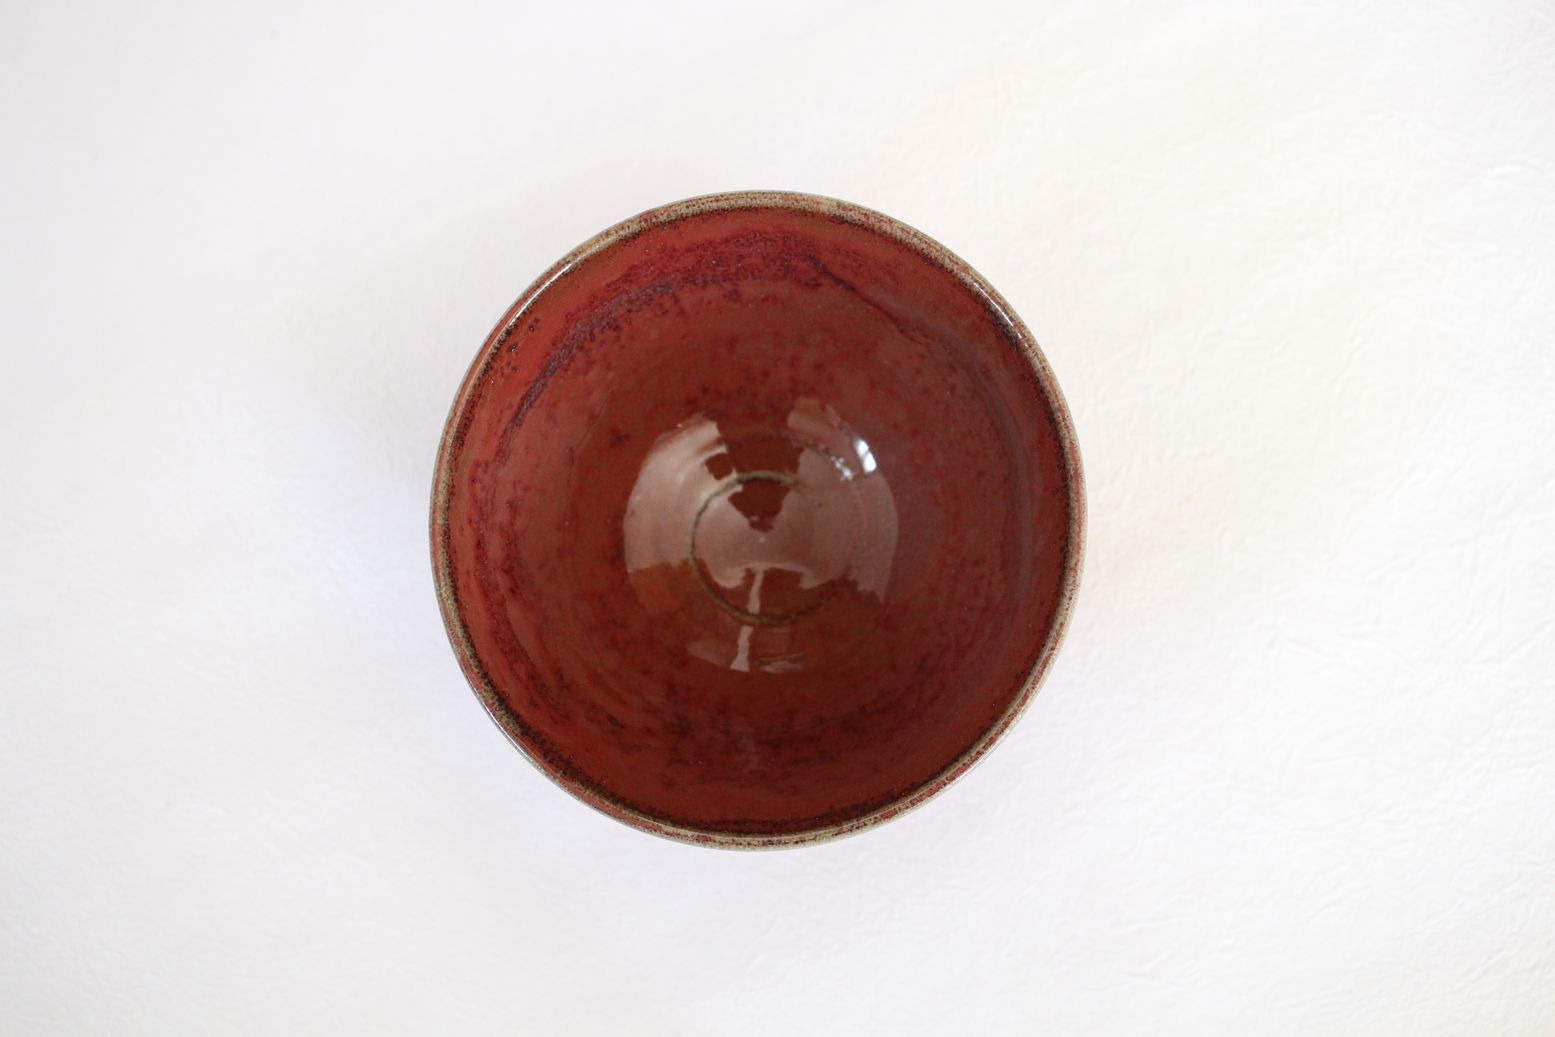 Kiyomizu sd pottery Japanese matcha tea ceremony bowl shinsha red